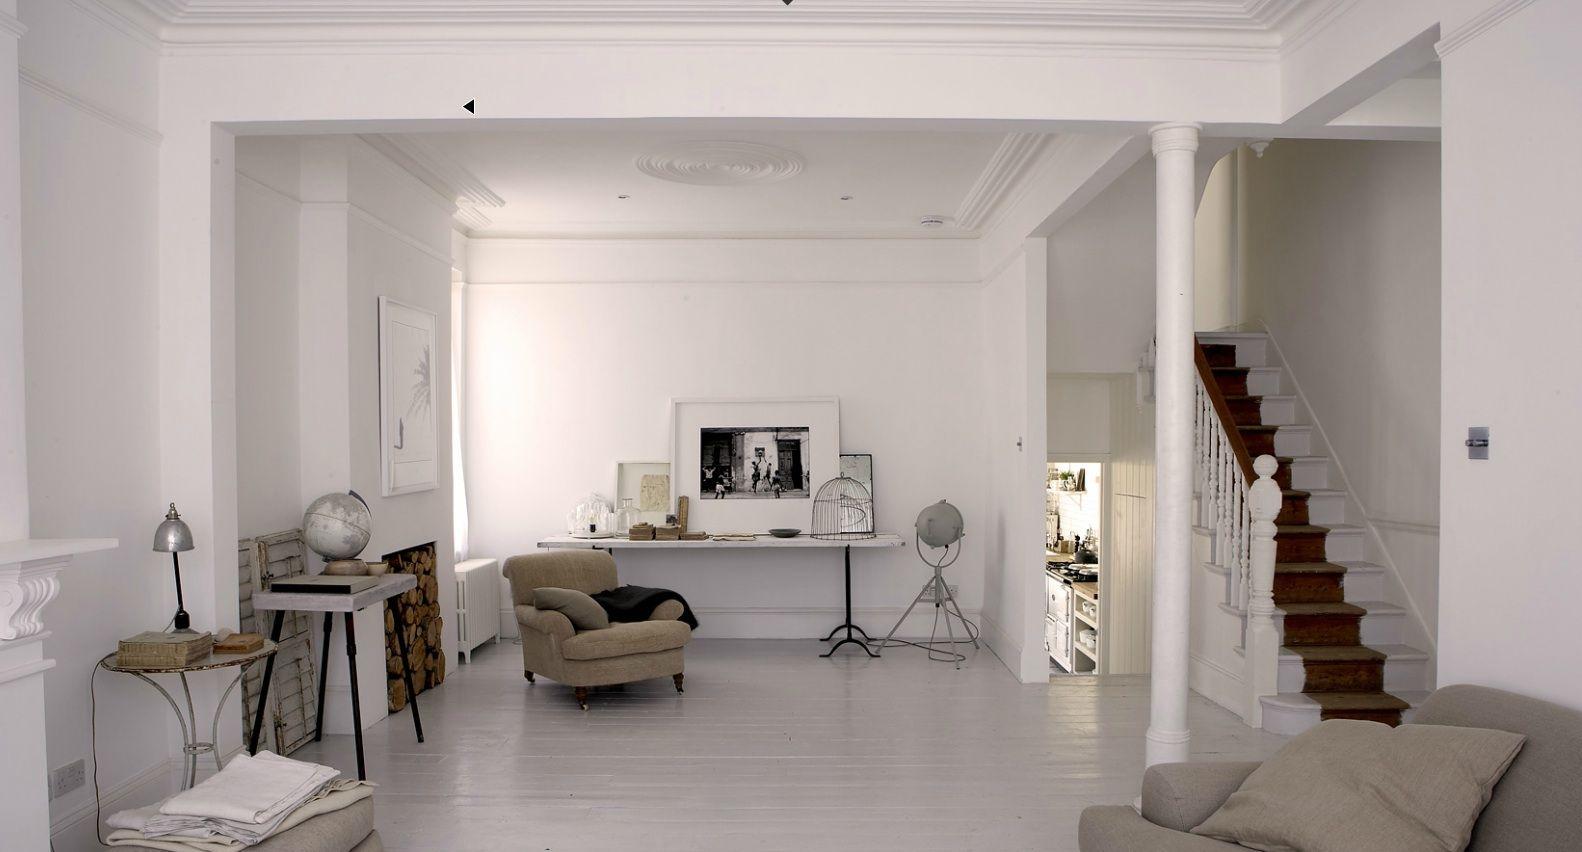 elle decoration kitchen lookbook Google Search Hallway